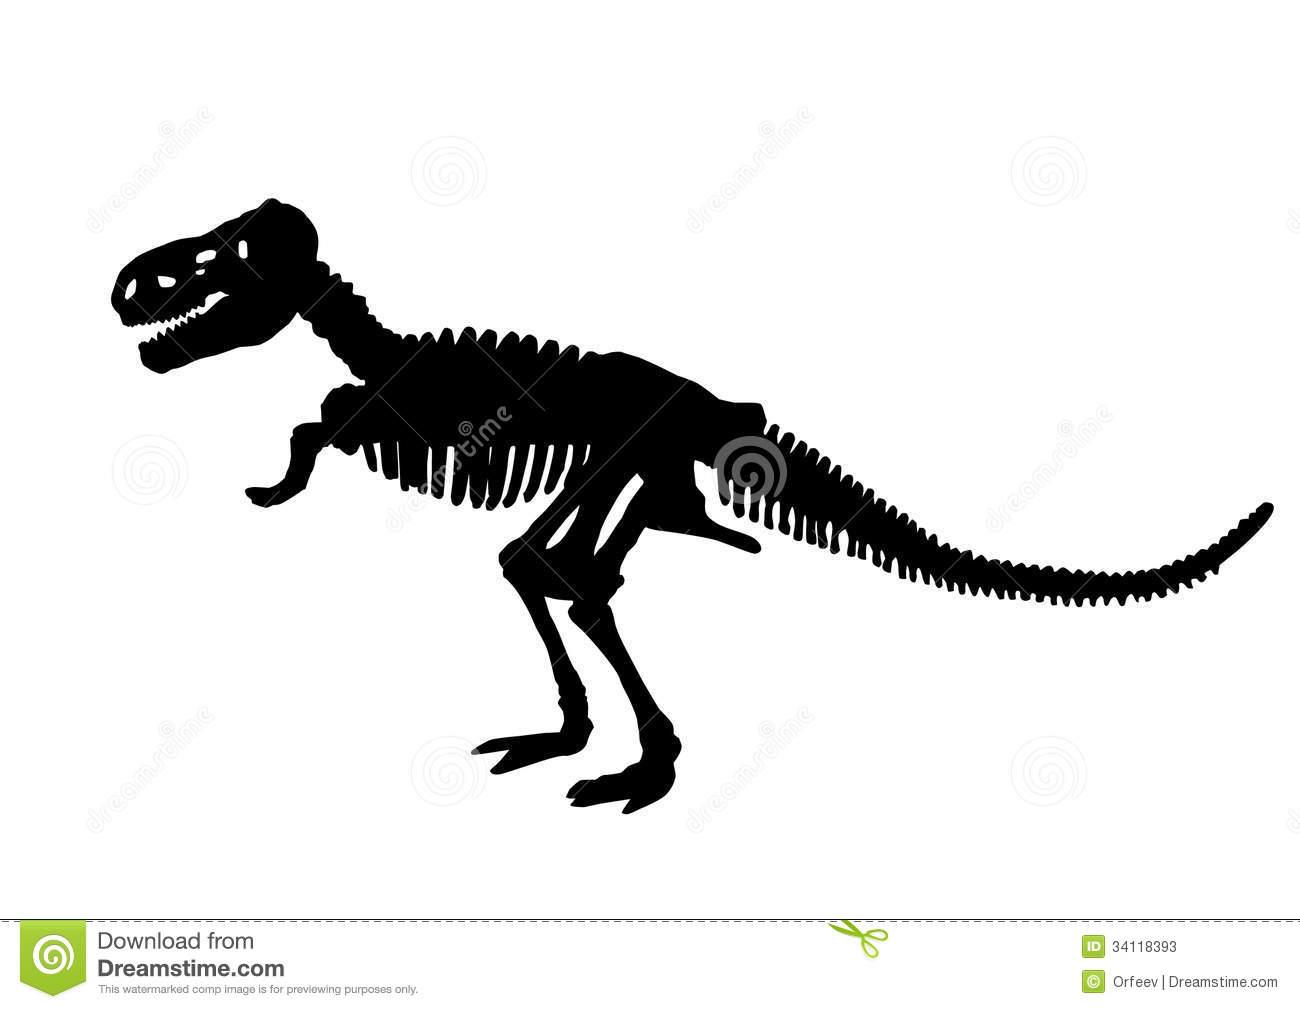 Sleleton clipart silhouette Clipart  Bones Dinosaur Collection